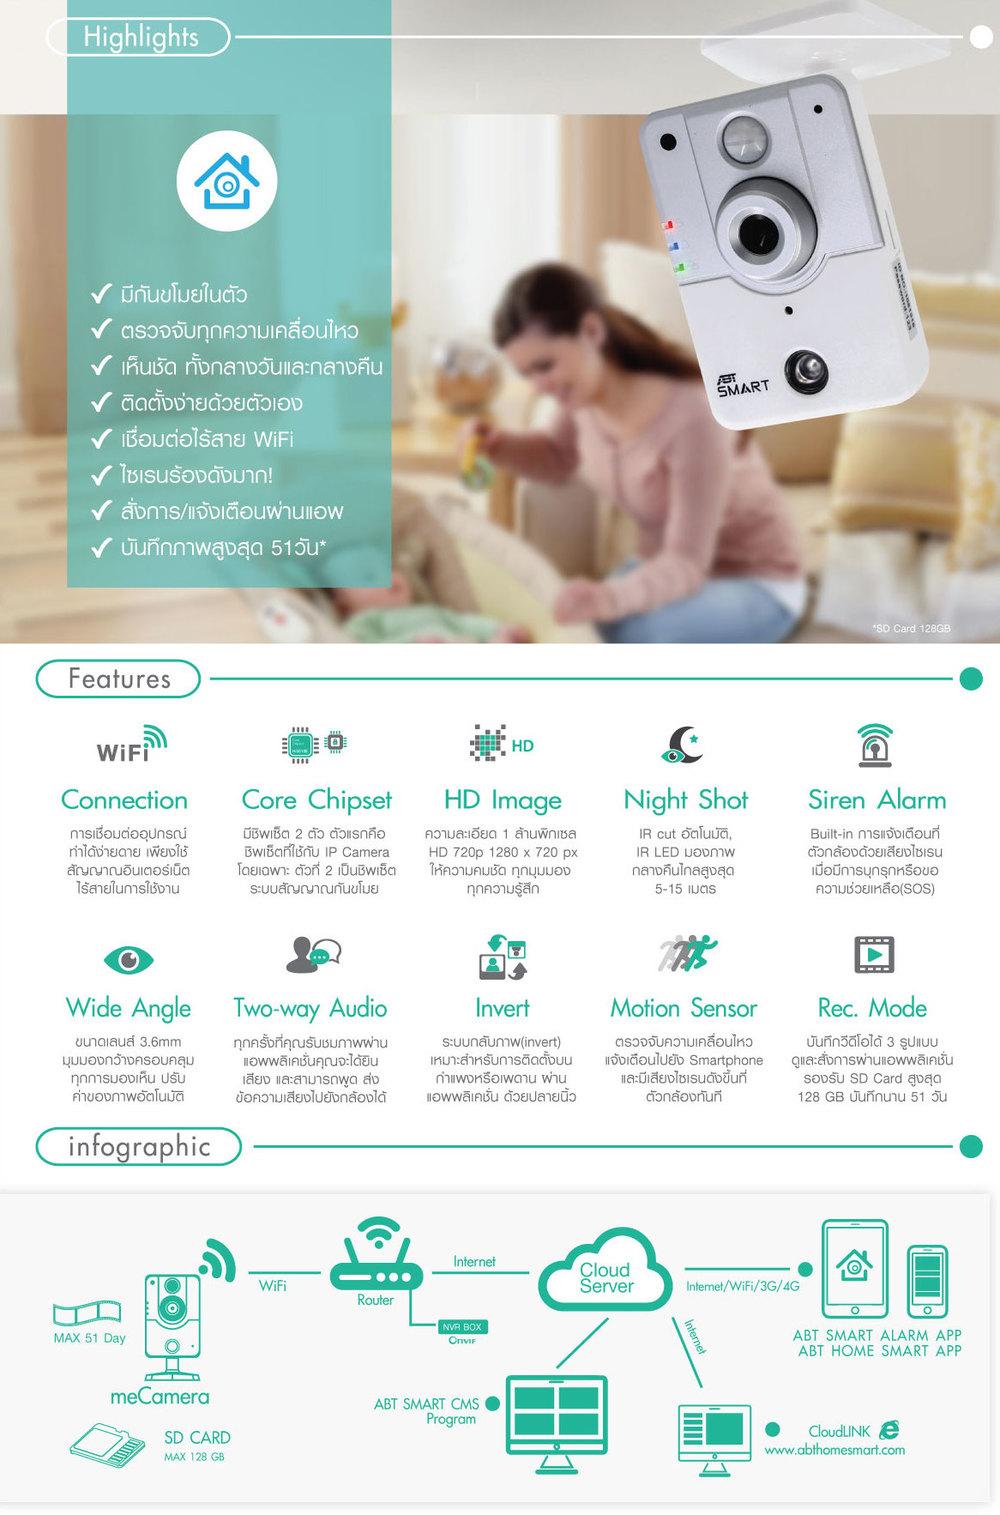 ABT SMART HOME : MECAMERA